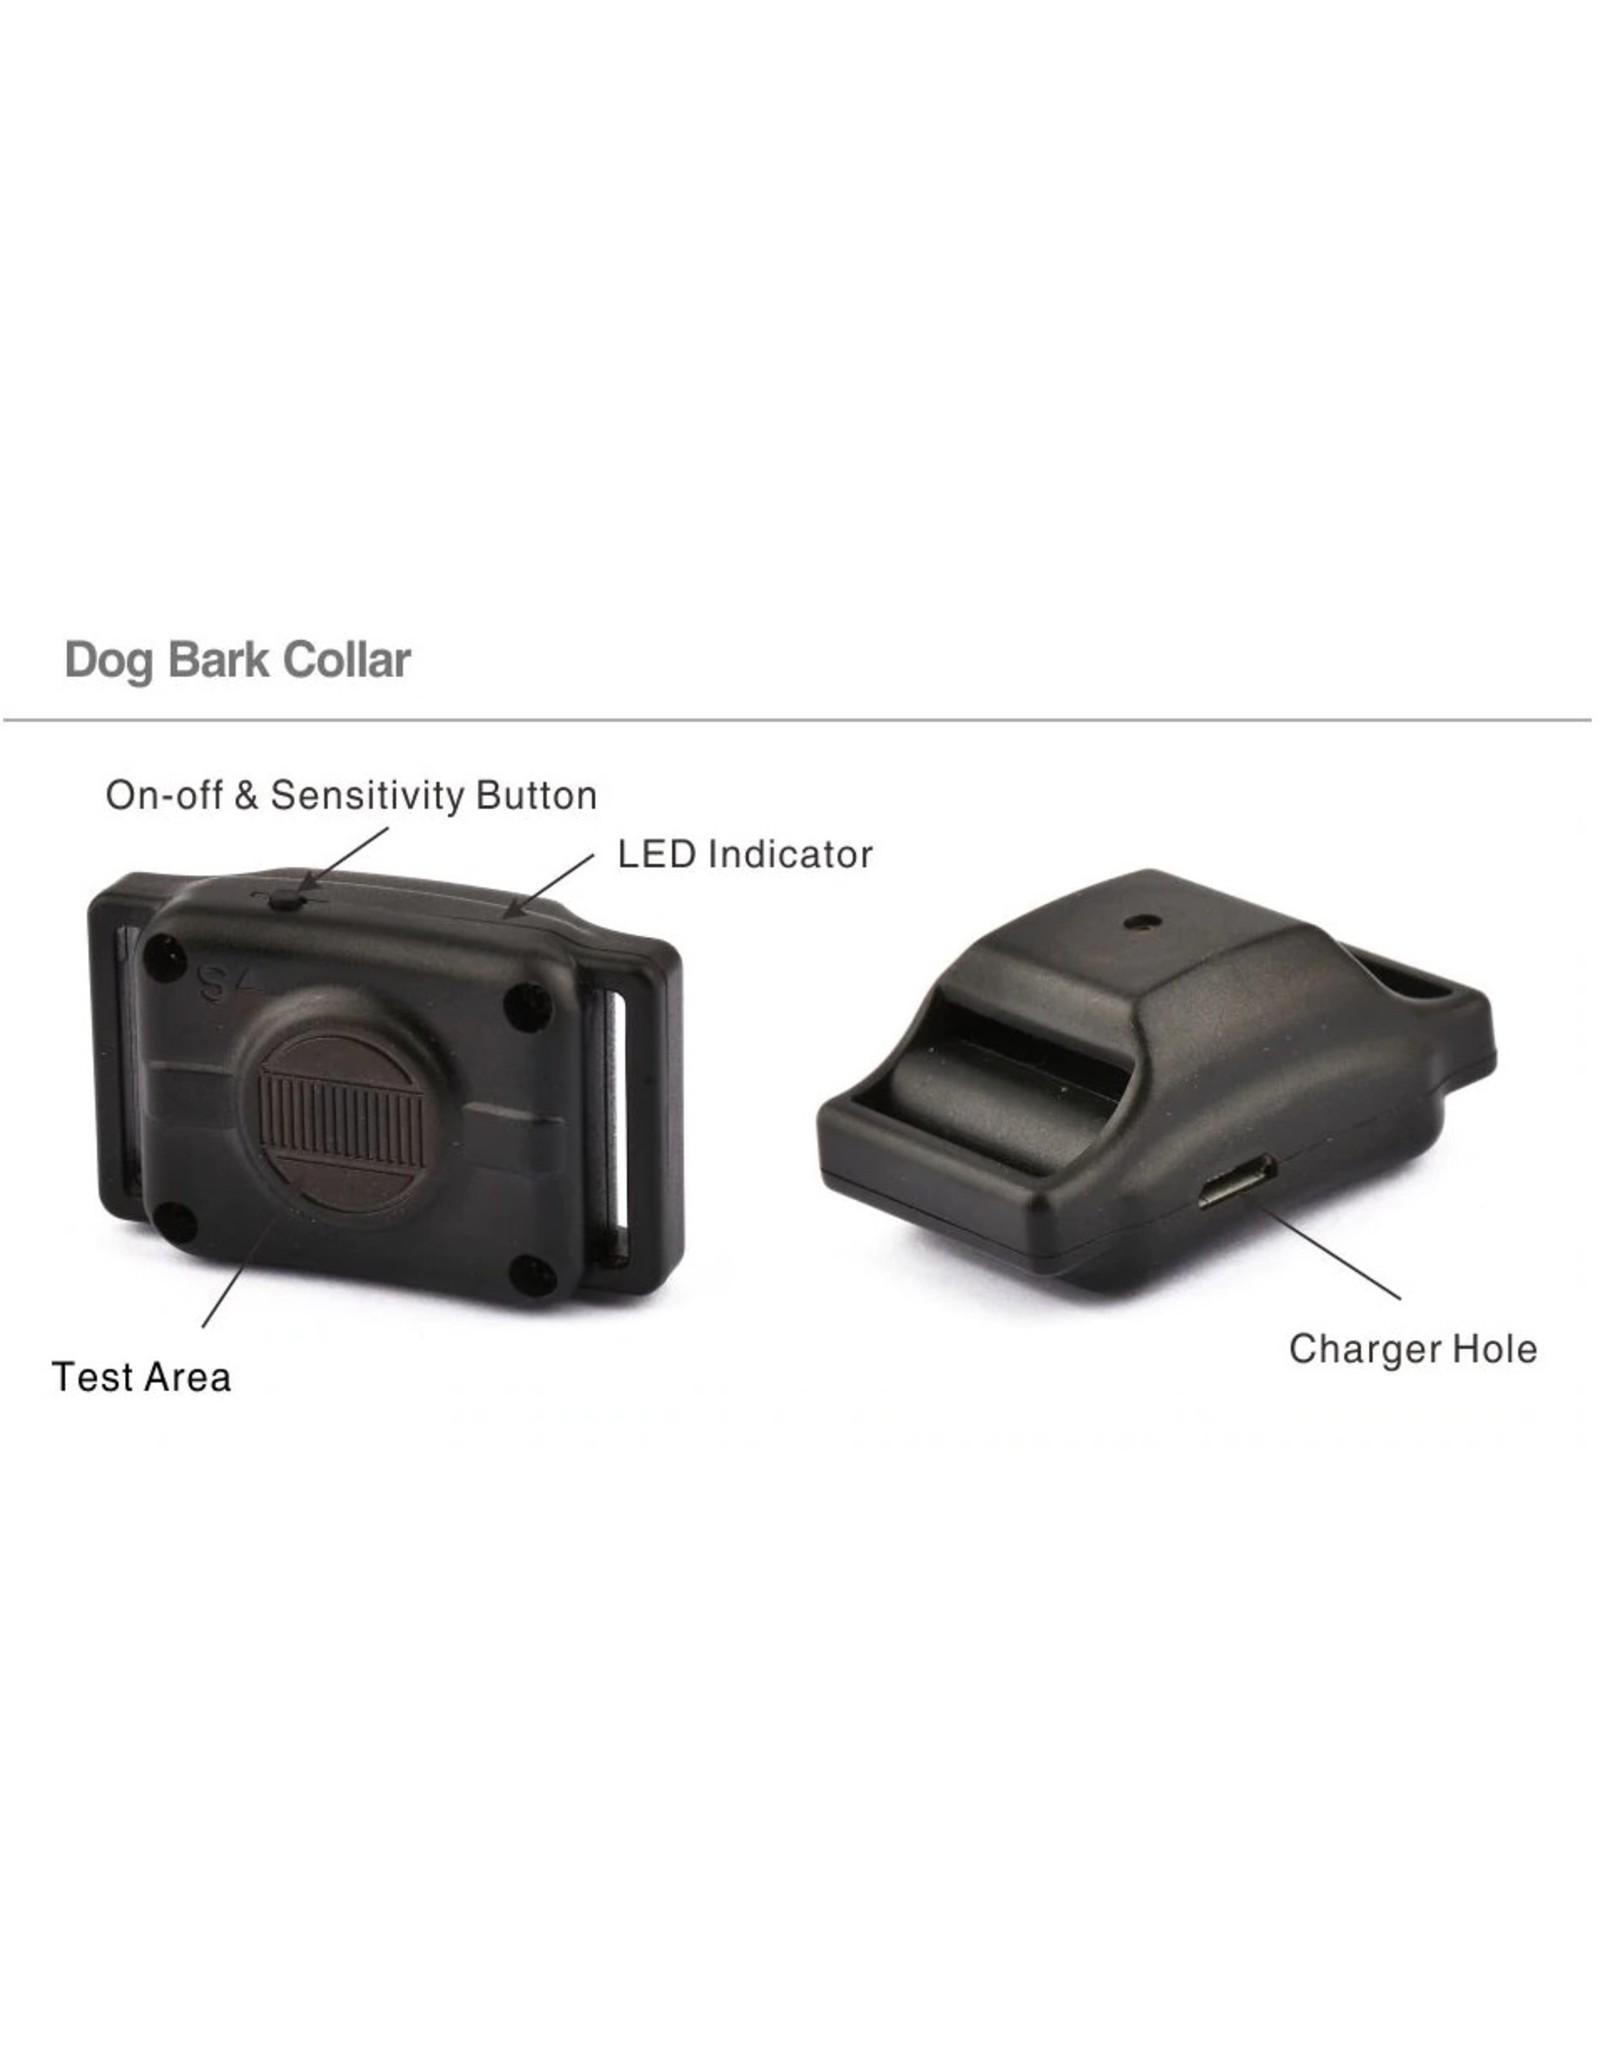 Hondenschorshalsband Huisdierproduct Blafstop Automatische Anti-blafcontrolehalsband Elektrisch Geen schokken Hond Puppy Training Ketting (deze hondenschorshalsband is klein en licht, ontwerp voor puppyhonden)